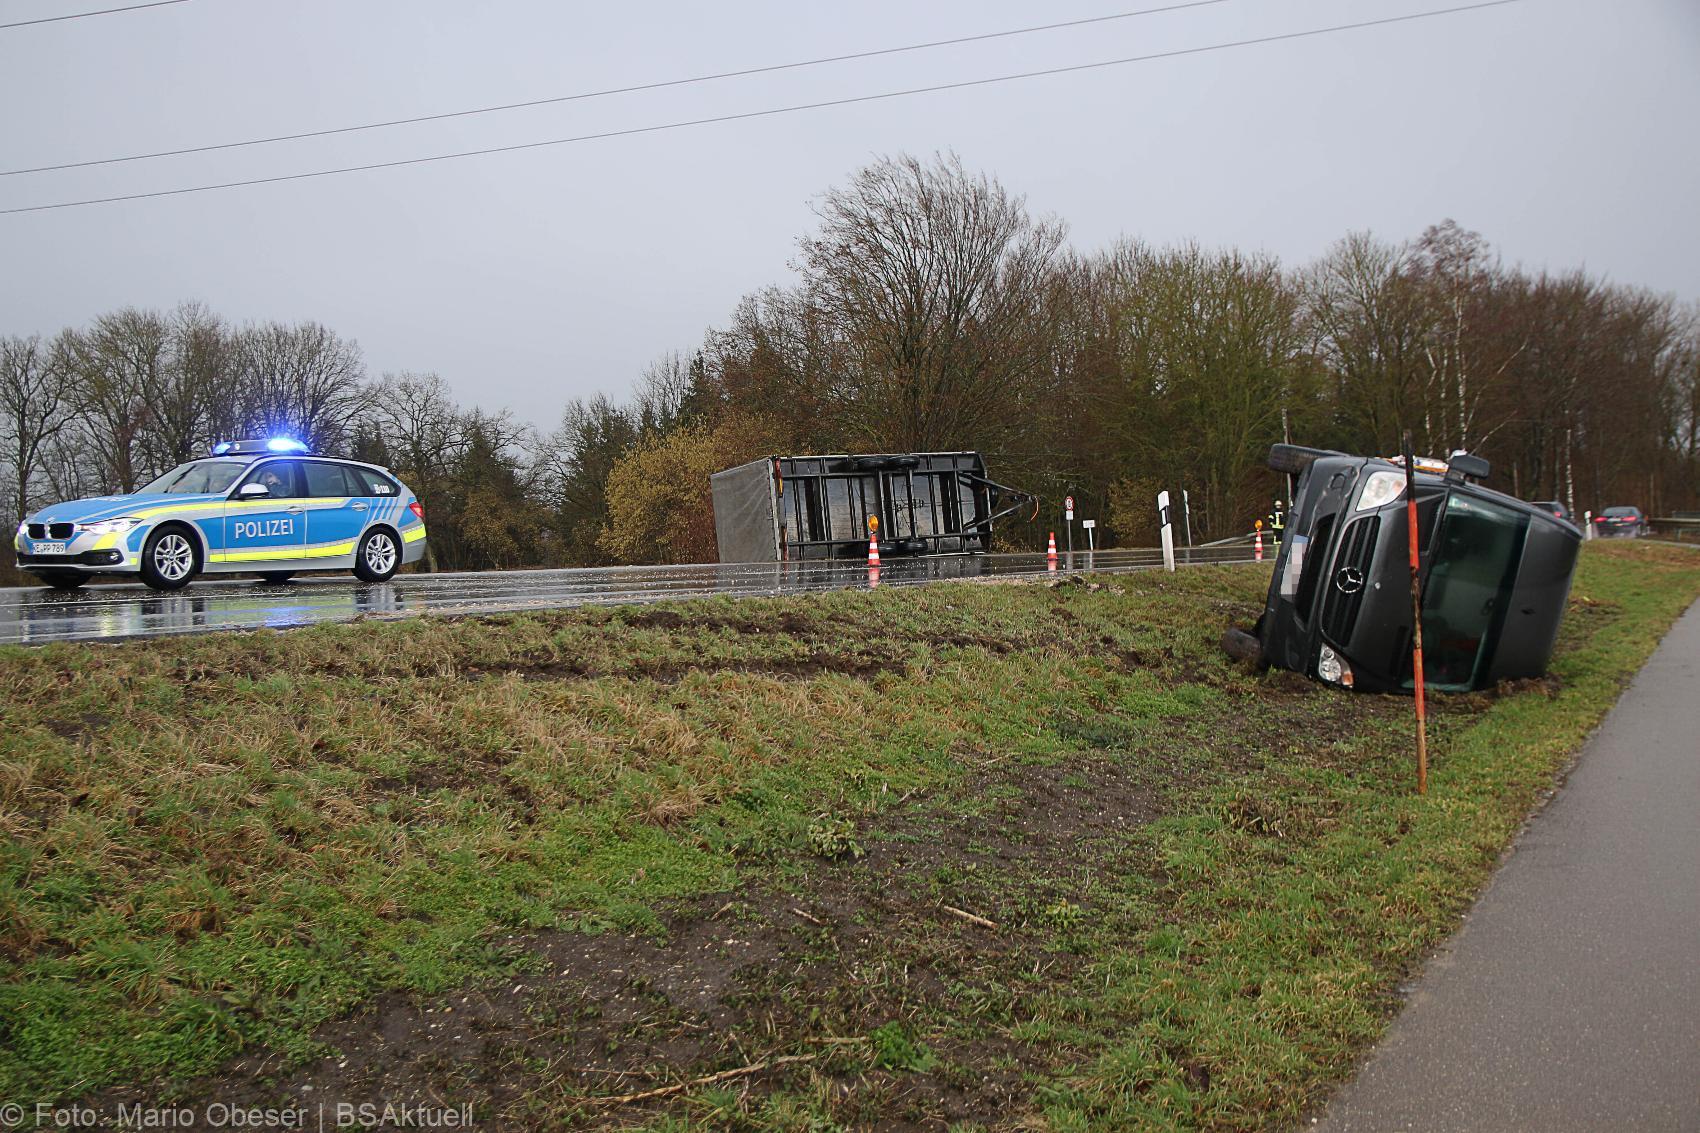 Transporter-Anhaenger-Gespann umgekippt 10022020 1